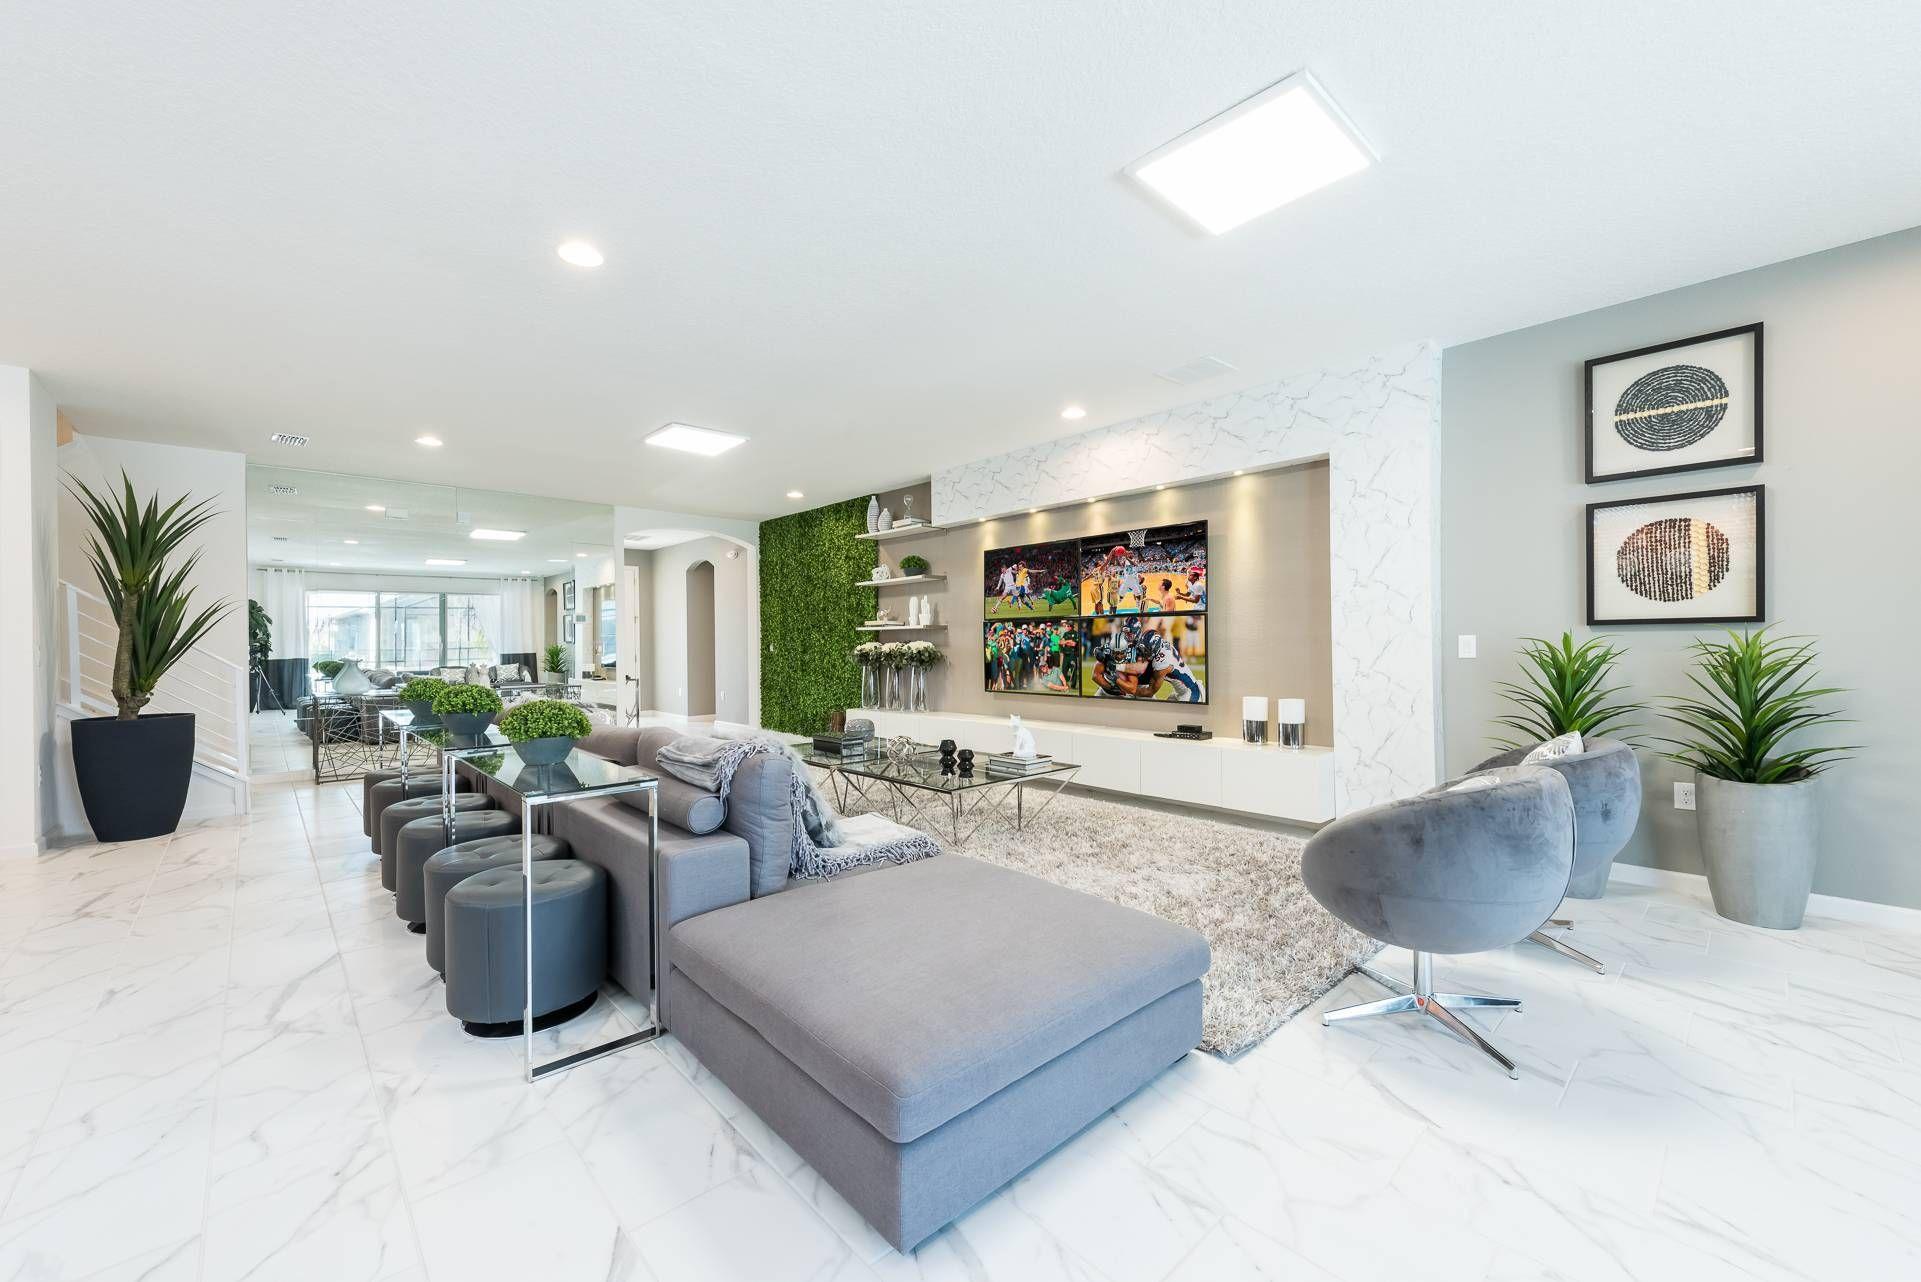 Vacation Homes Collection – Aluguel de casa em Orlando / Disney